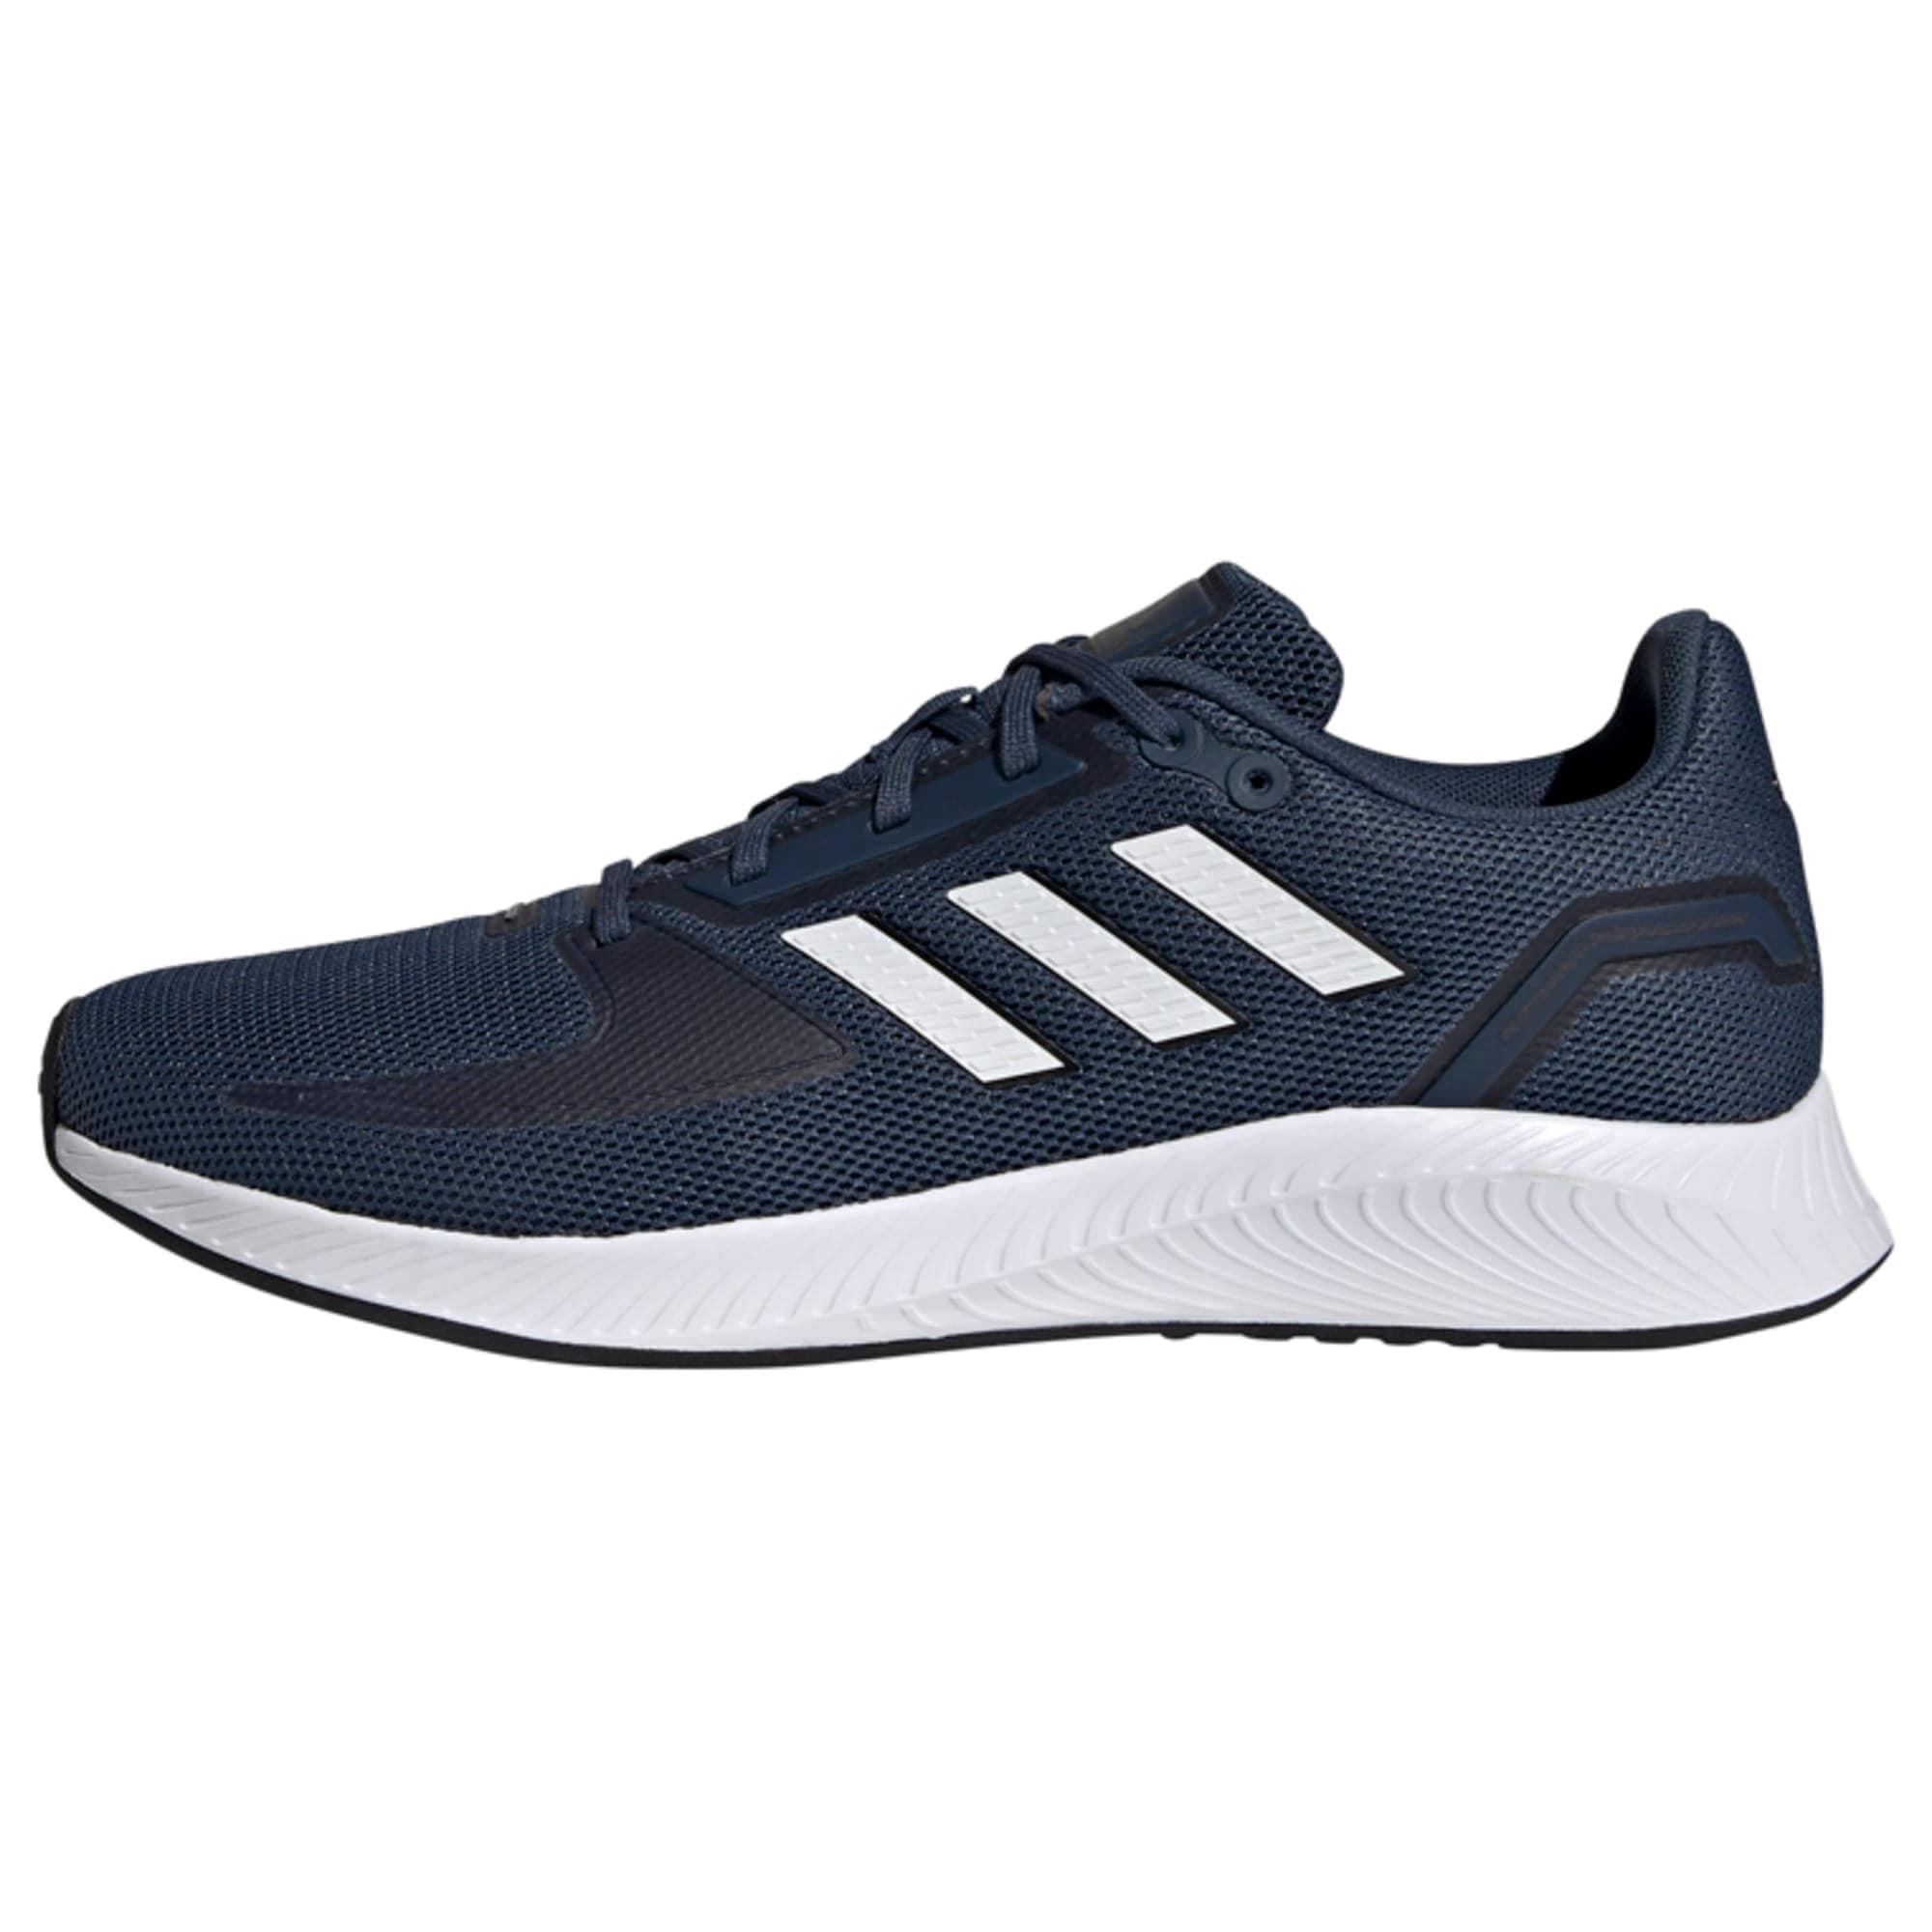 ADIDAS PERFORMANCE Bėgimo batai balta / tamsiai mėlyna